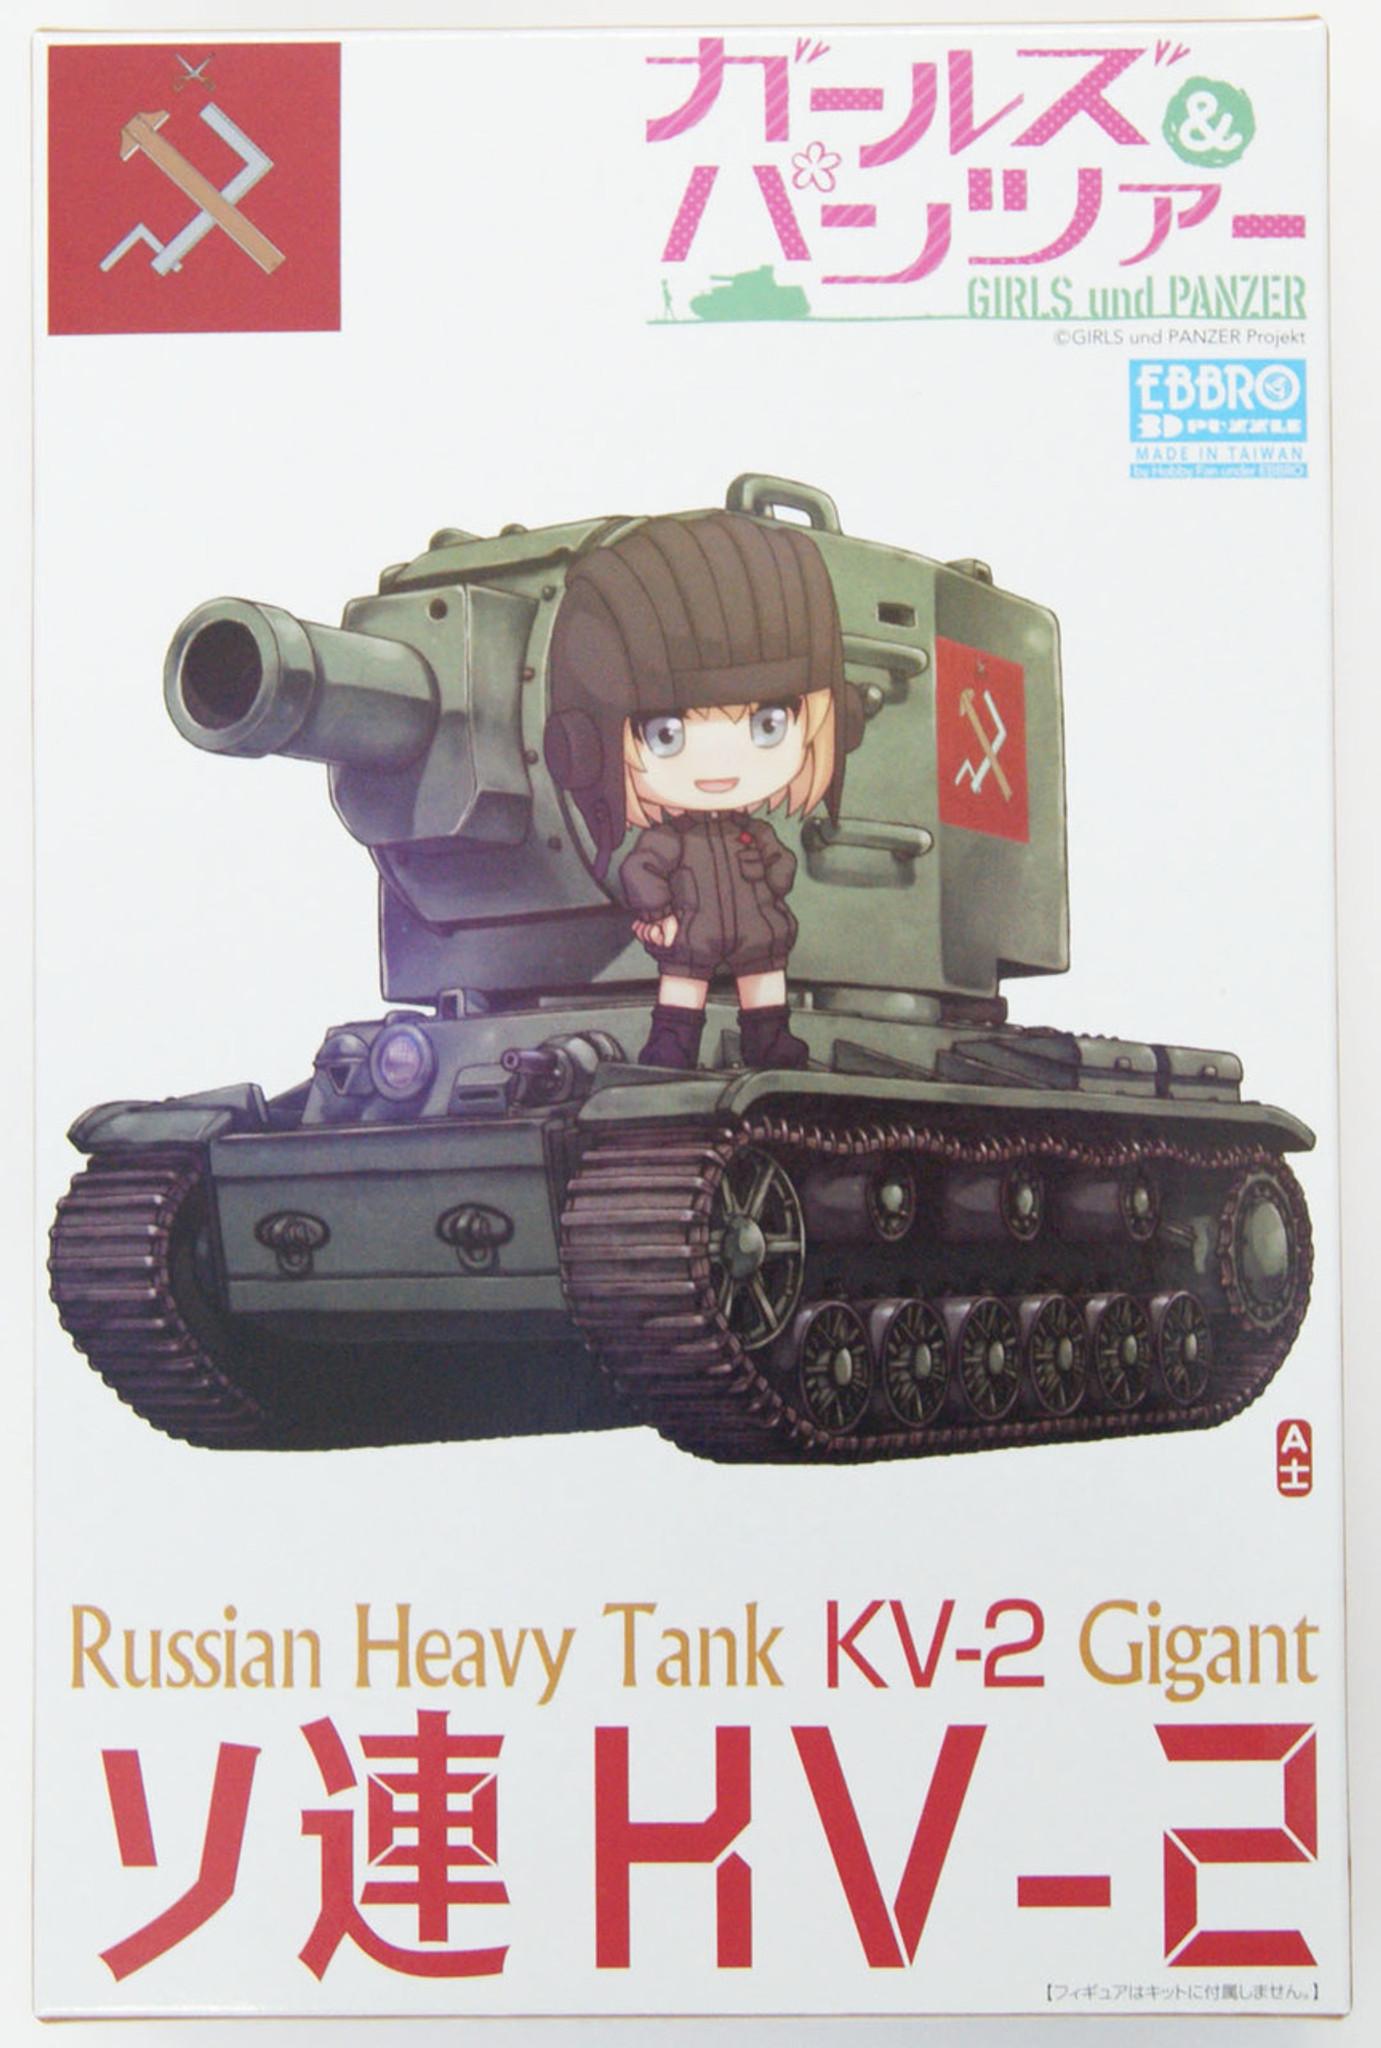 Ebbro 30002 Girls und Panzer Russian Heavy Tank KV-2 Gigant Non Scale Kit